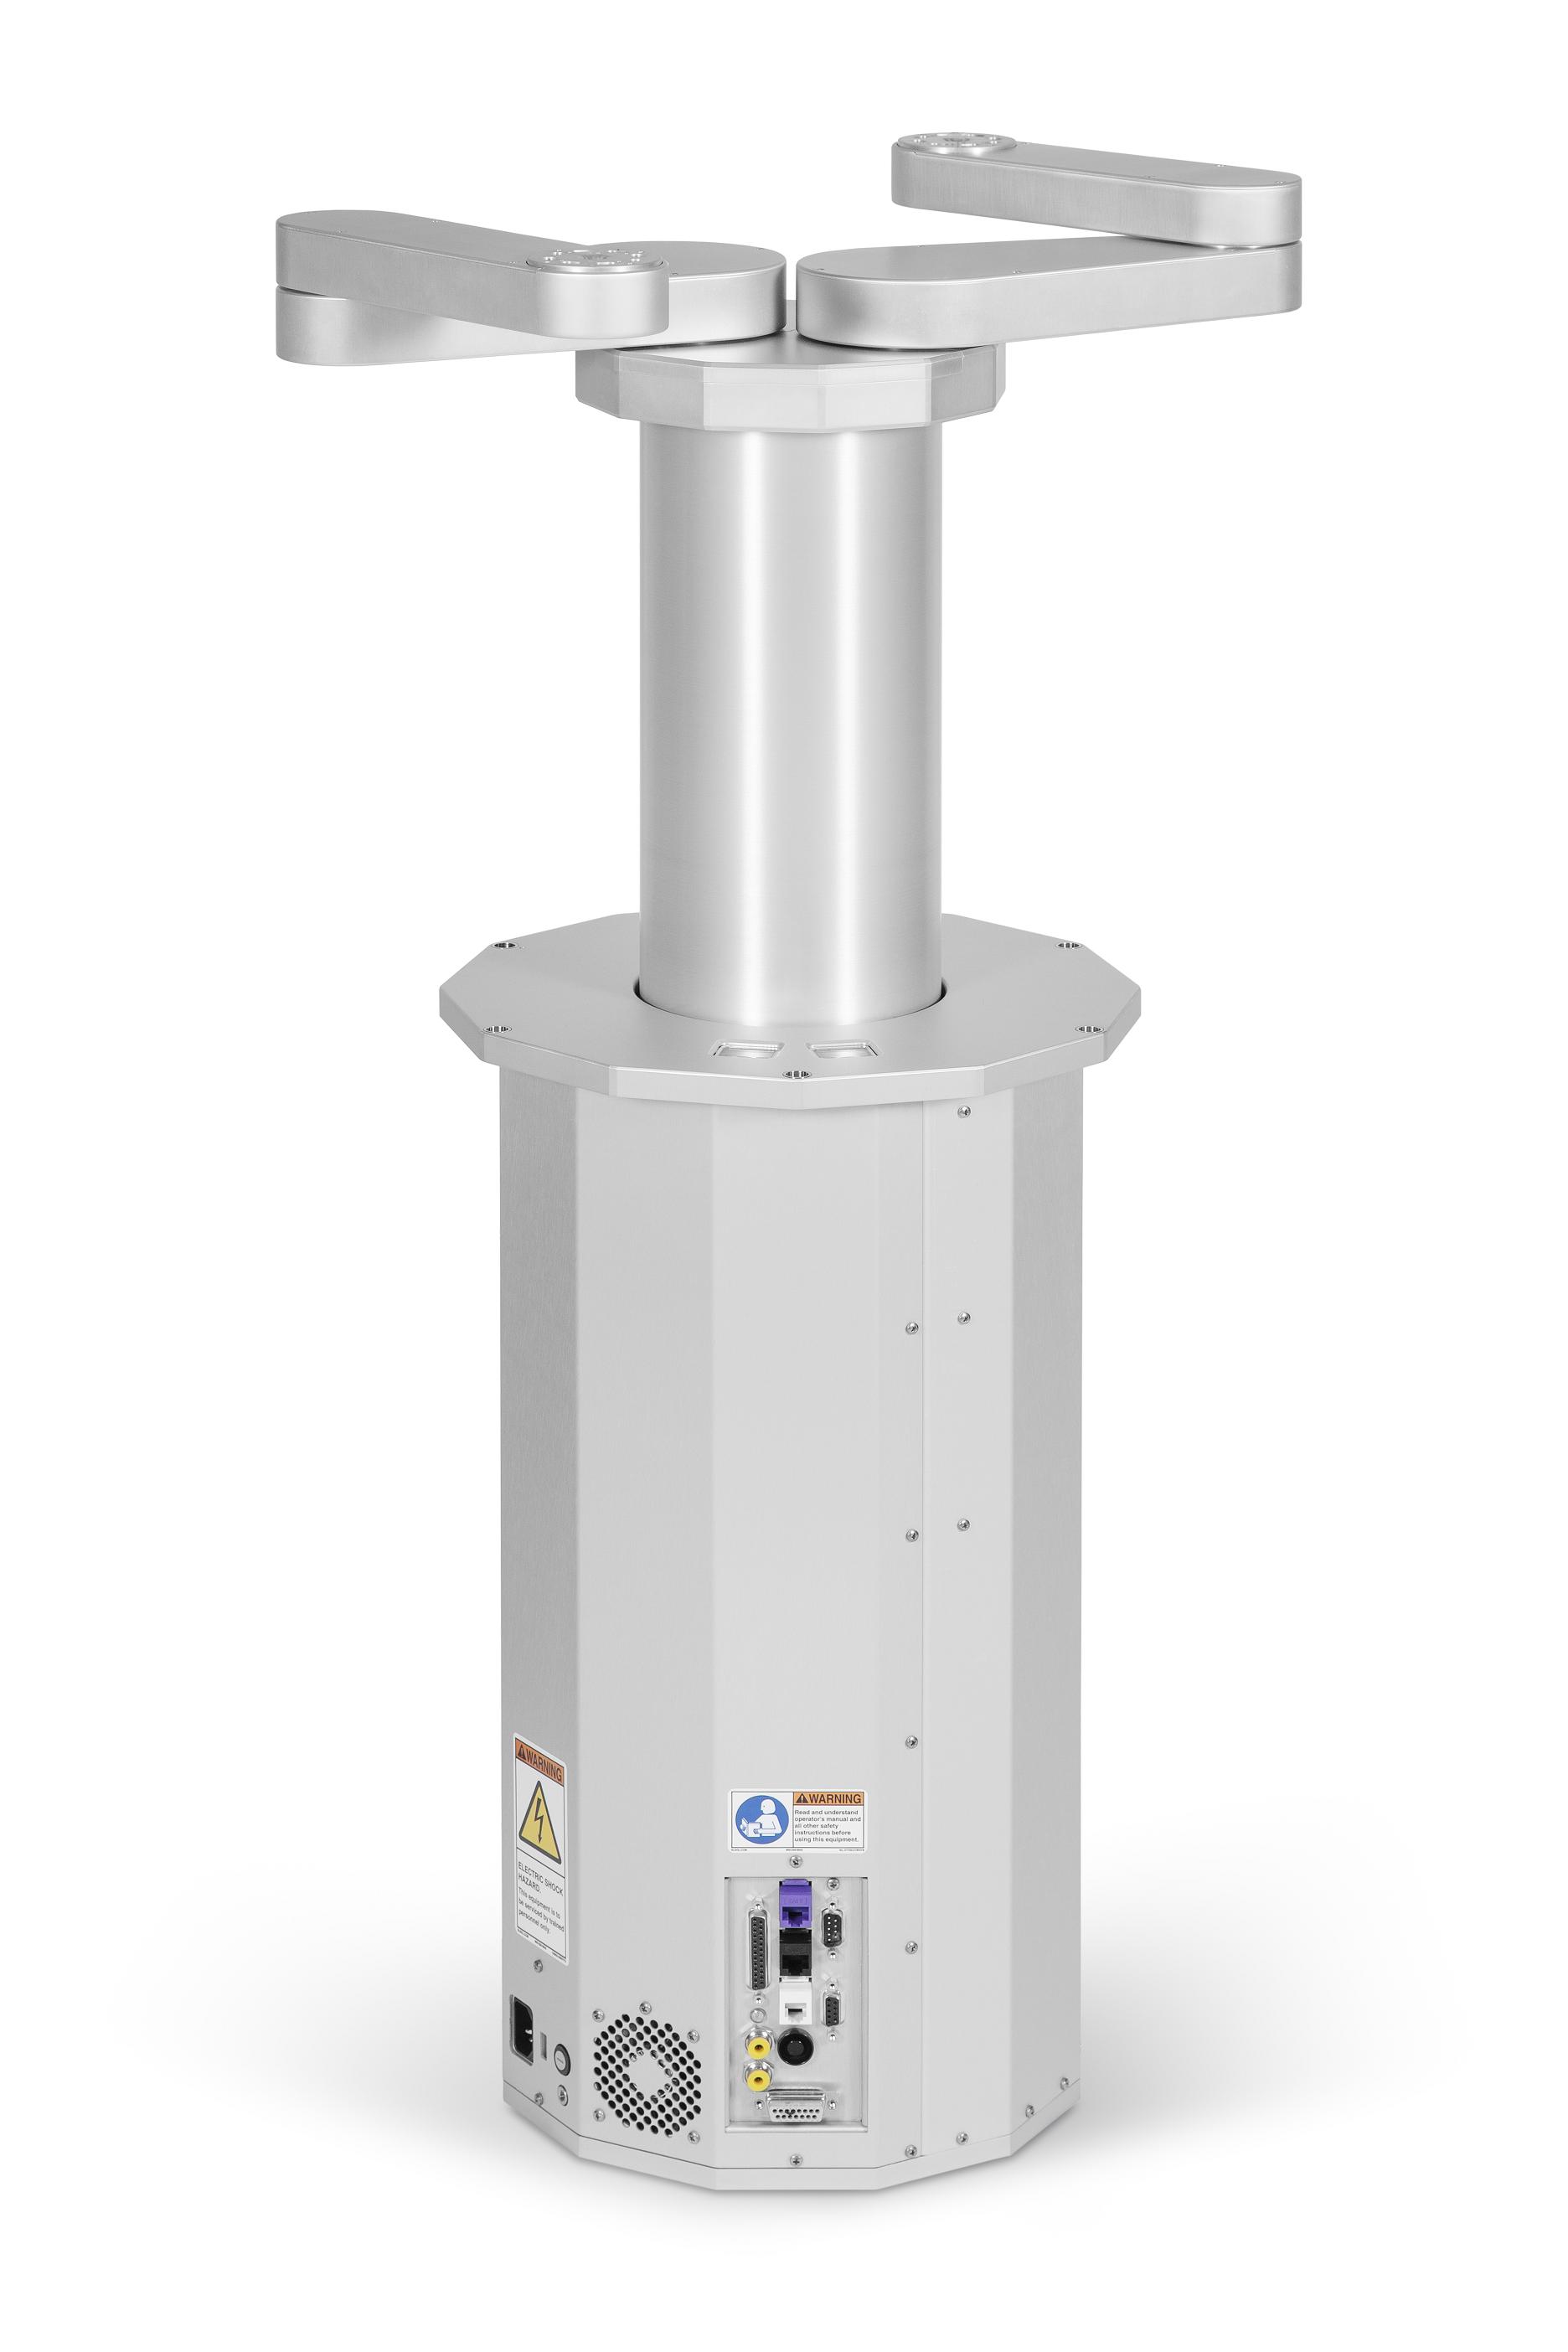 Diamond H4 Wafer Handling Robot Image